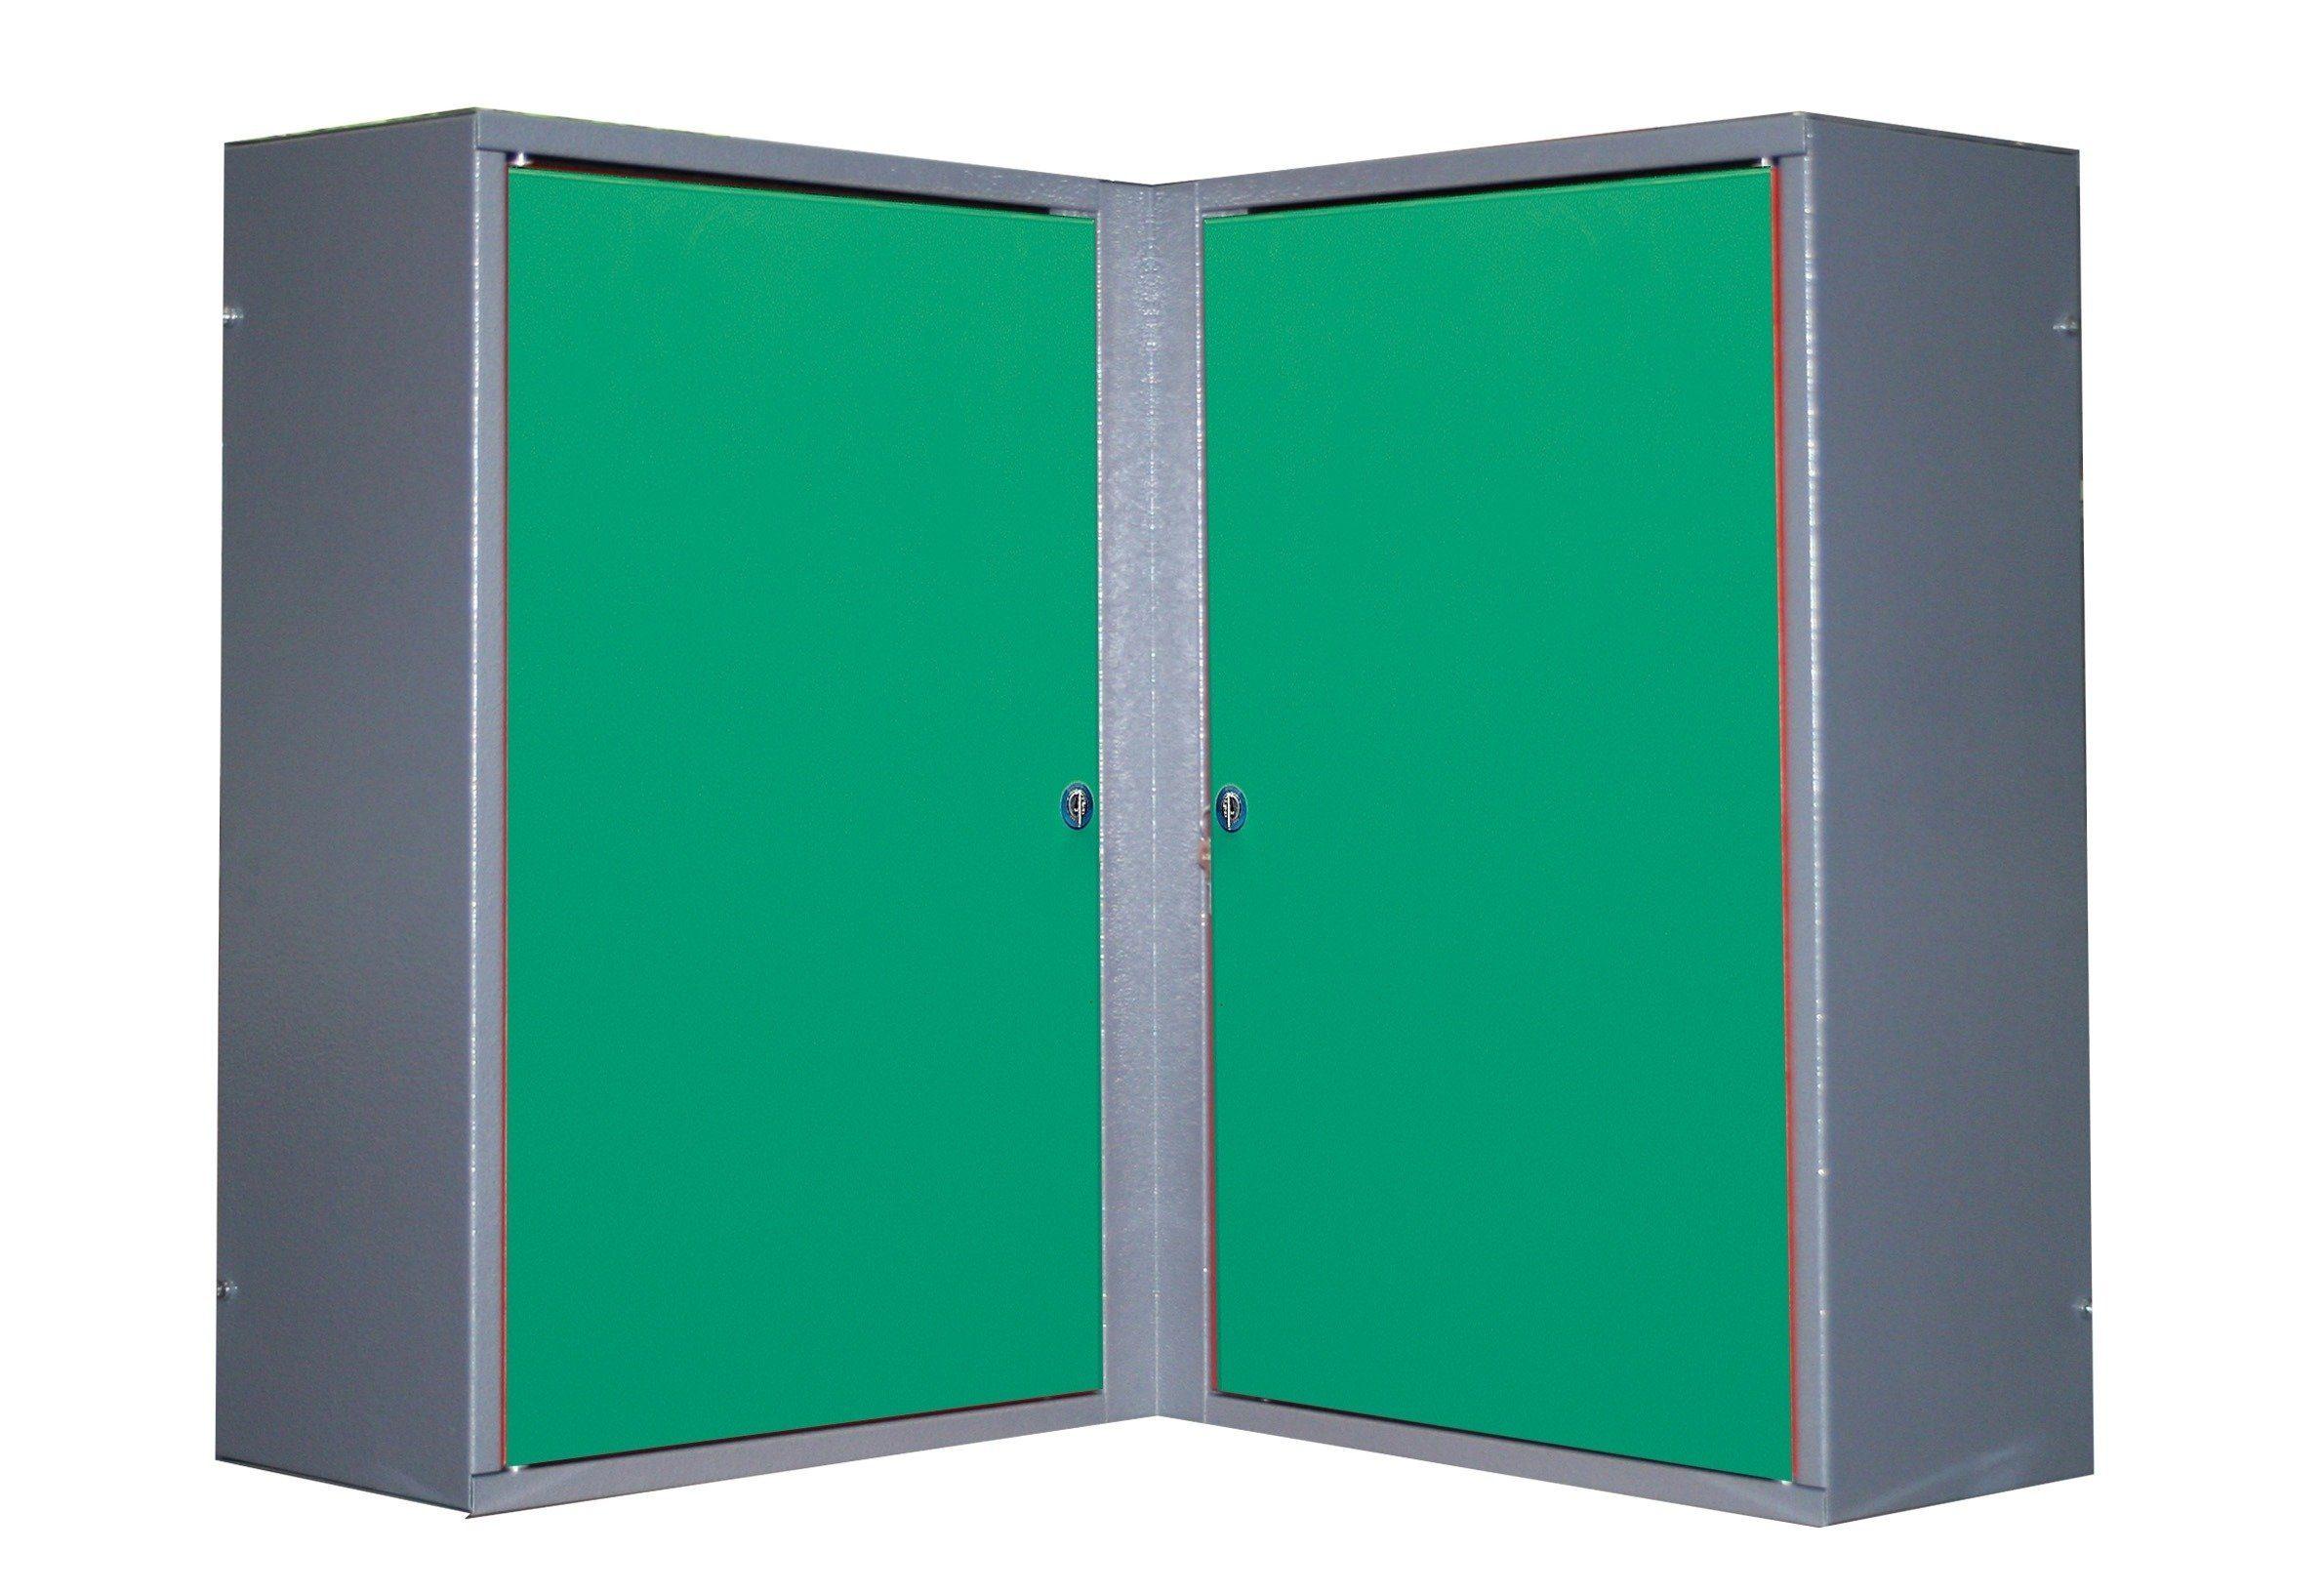 Küpper Eck-Hängeschrank »2 Türen, 4 Einlegeböden, in grün«